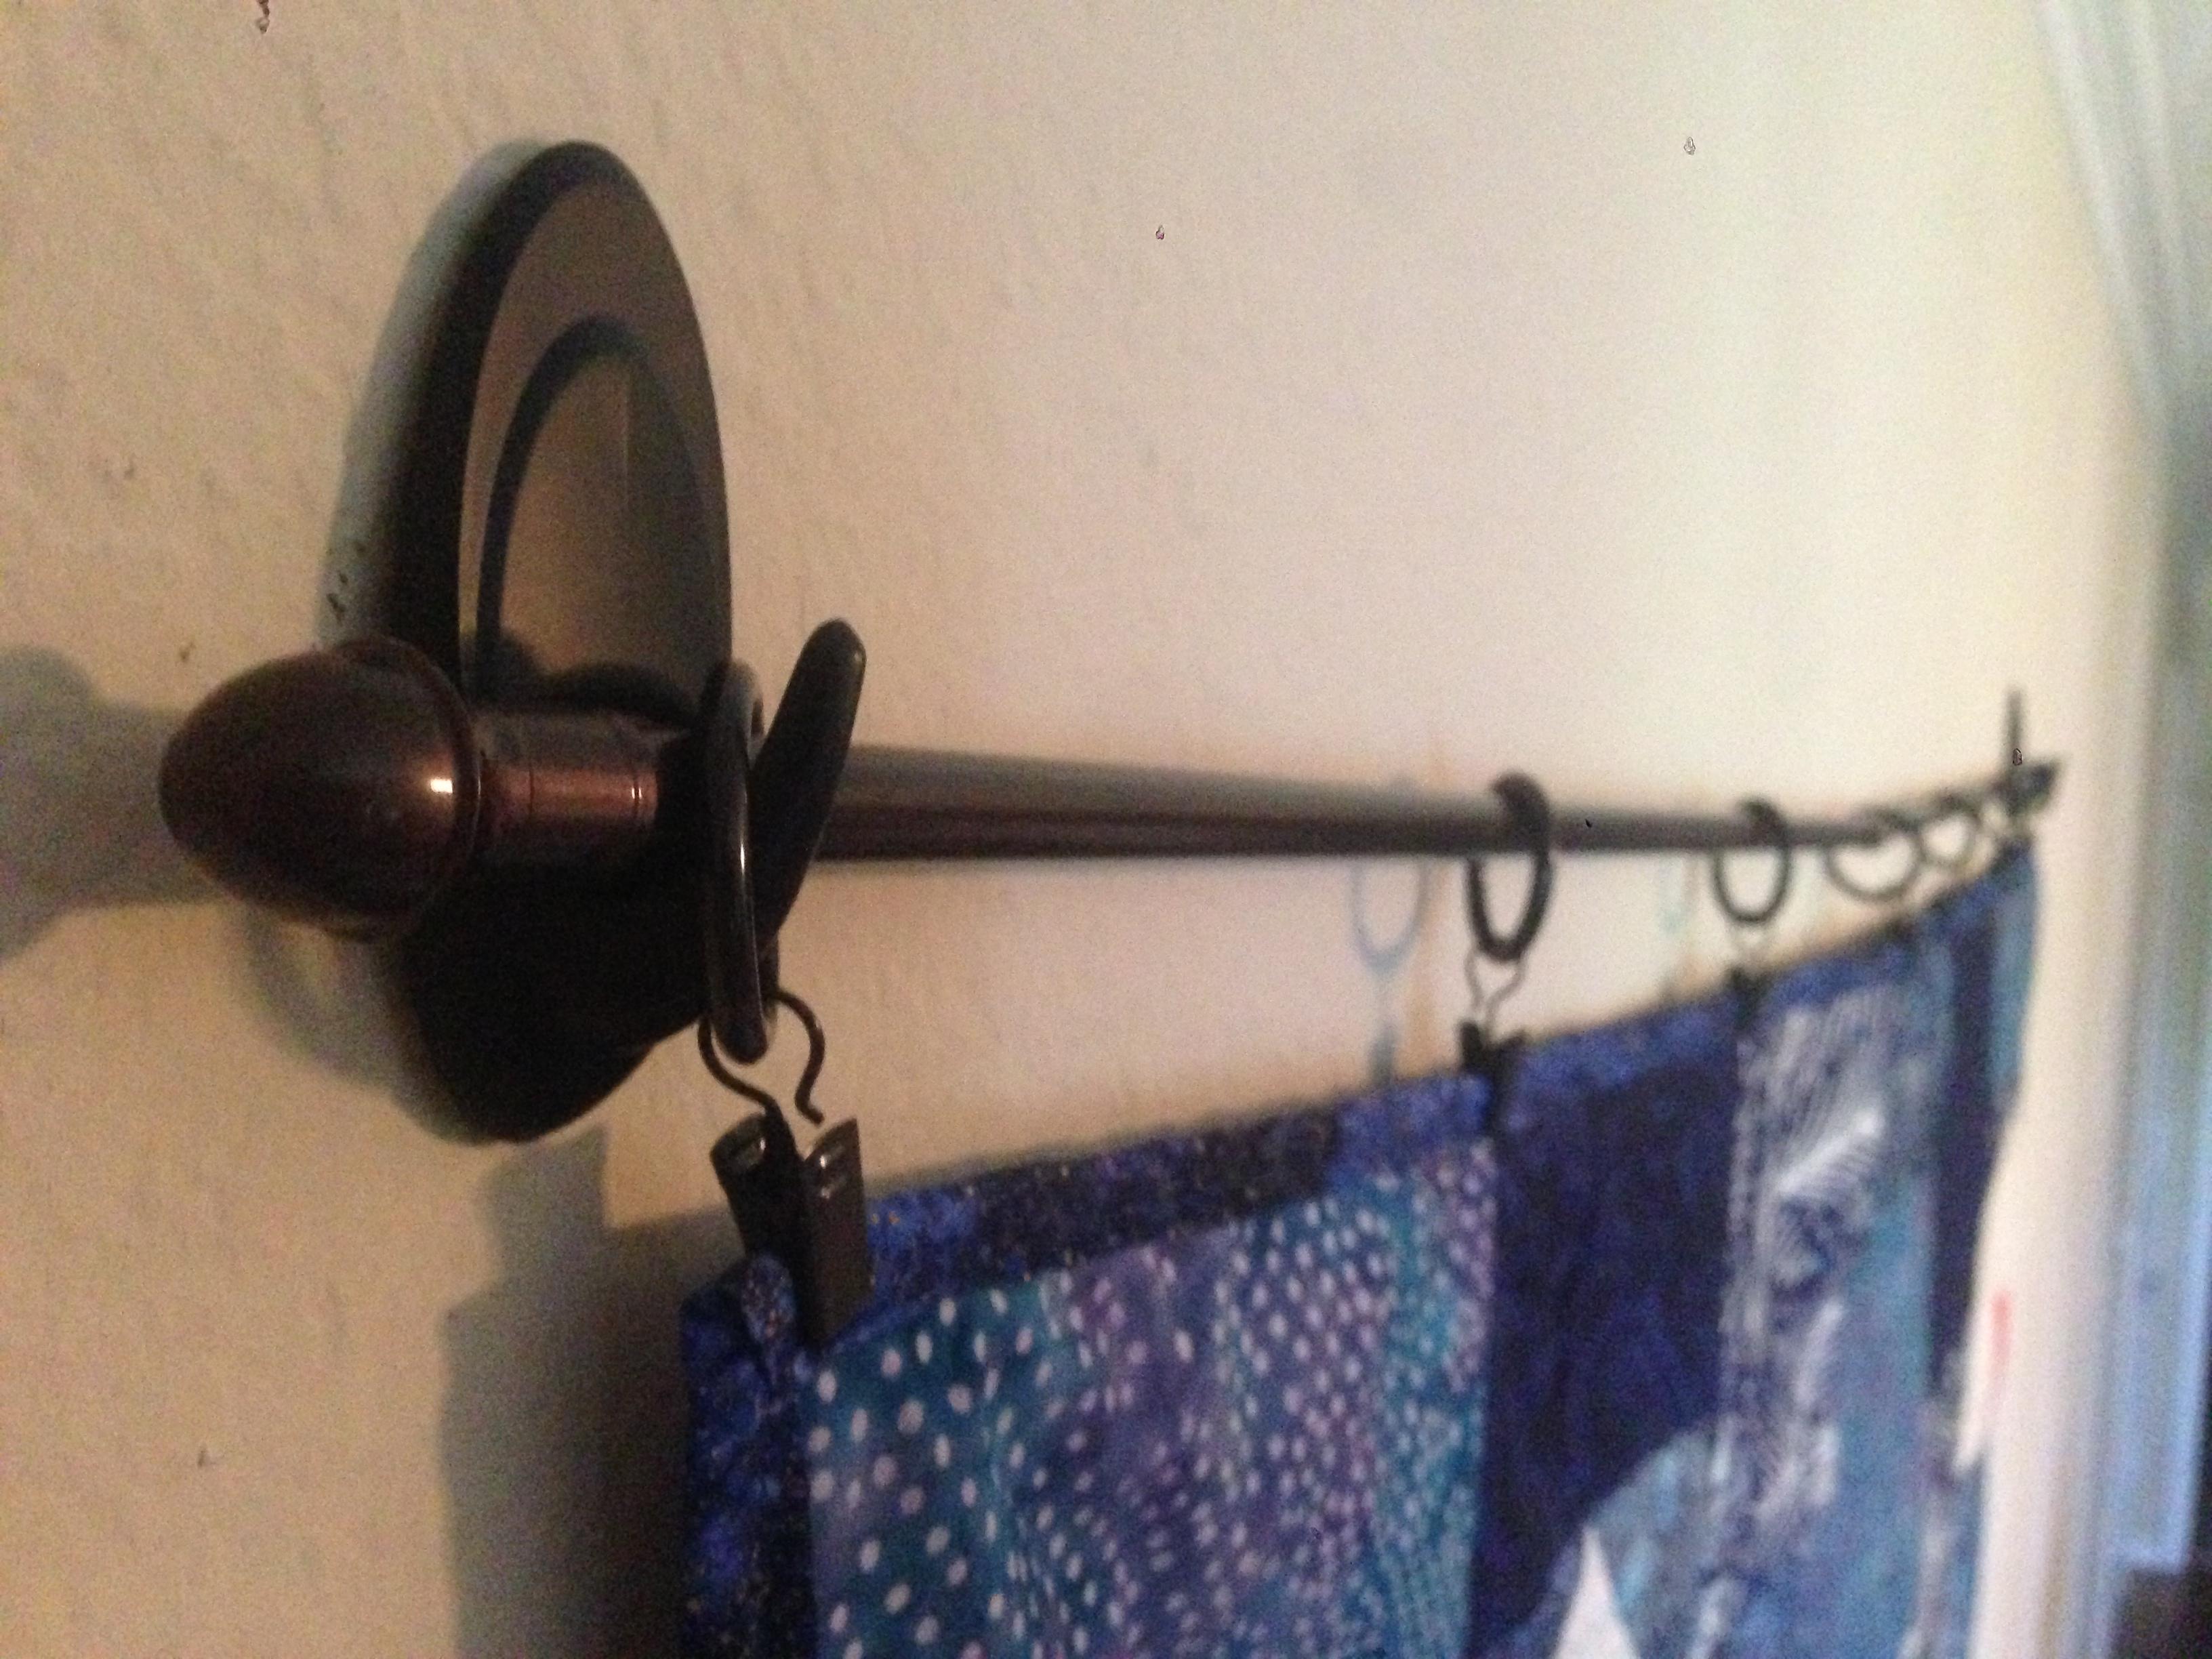 Project Pinterest Diy No Sew No Holes Quilt Hanger The